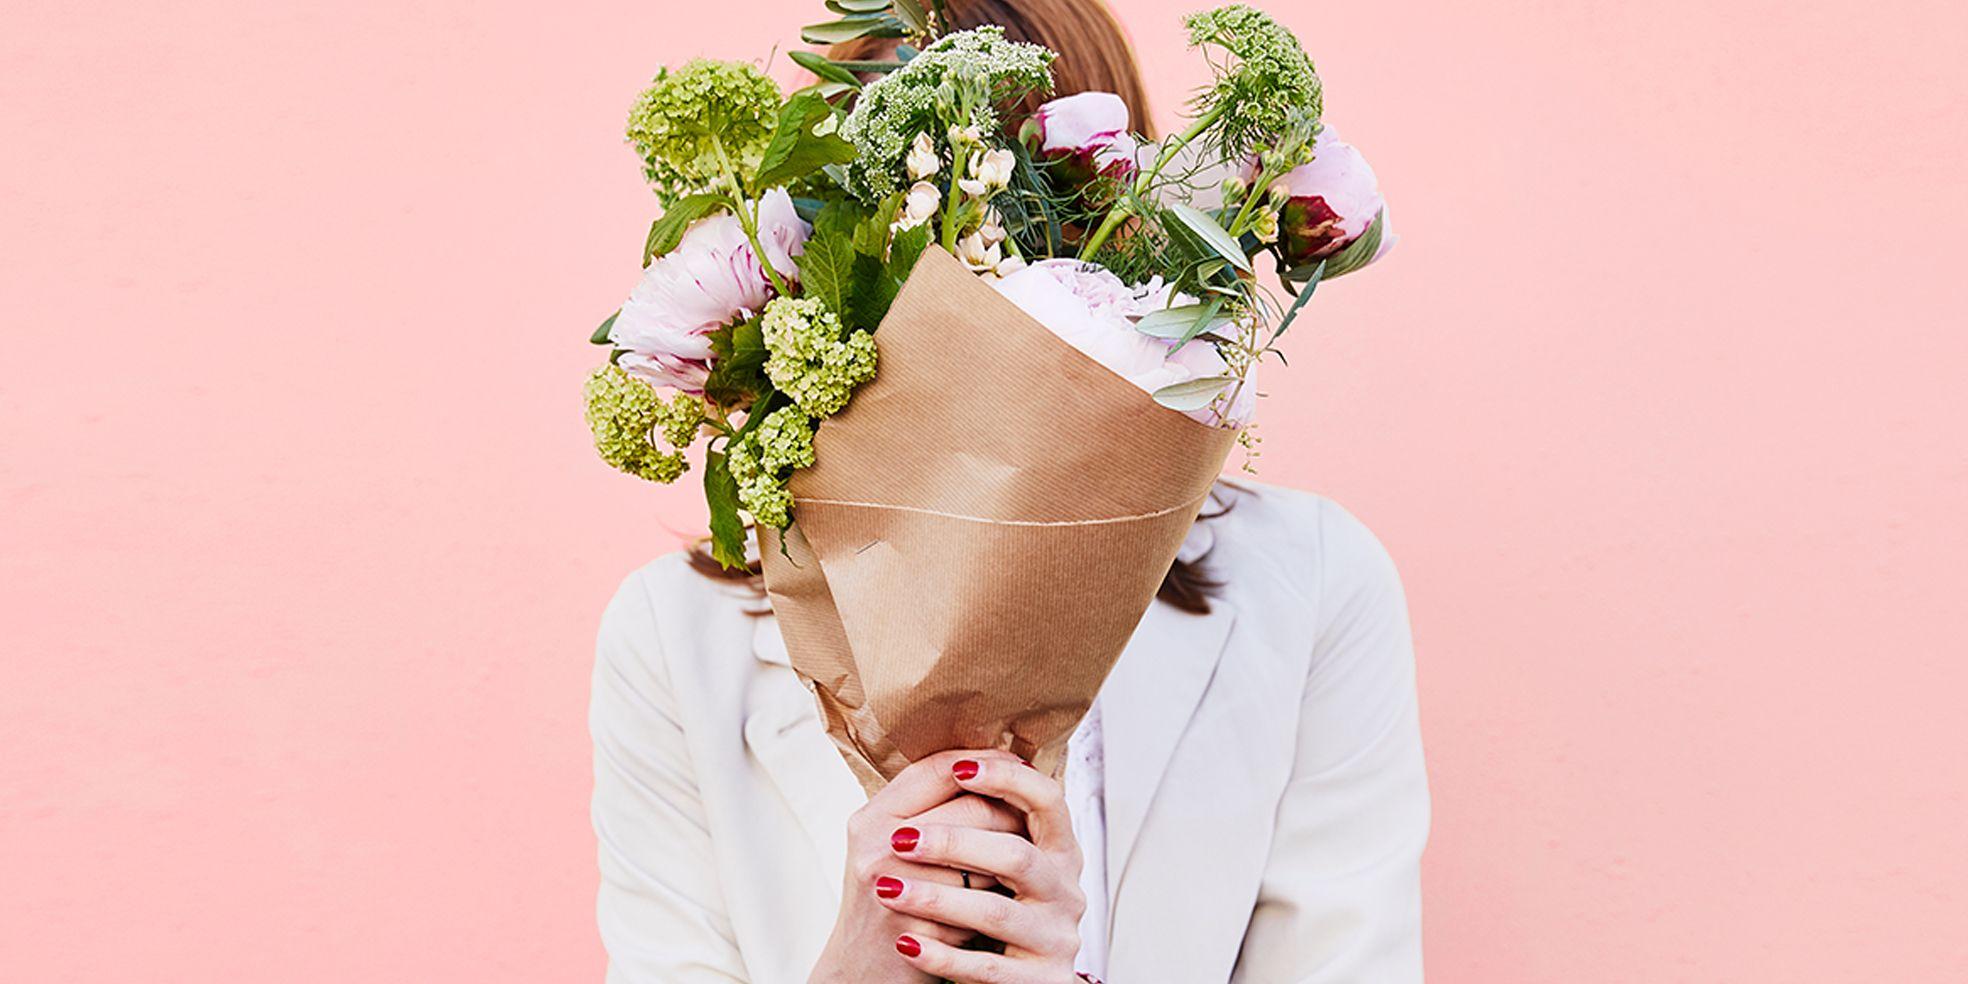 best online flower delivery 2019